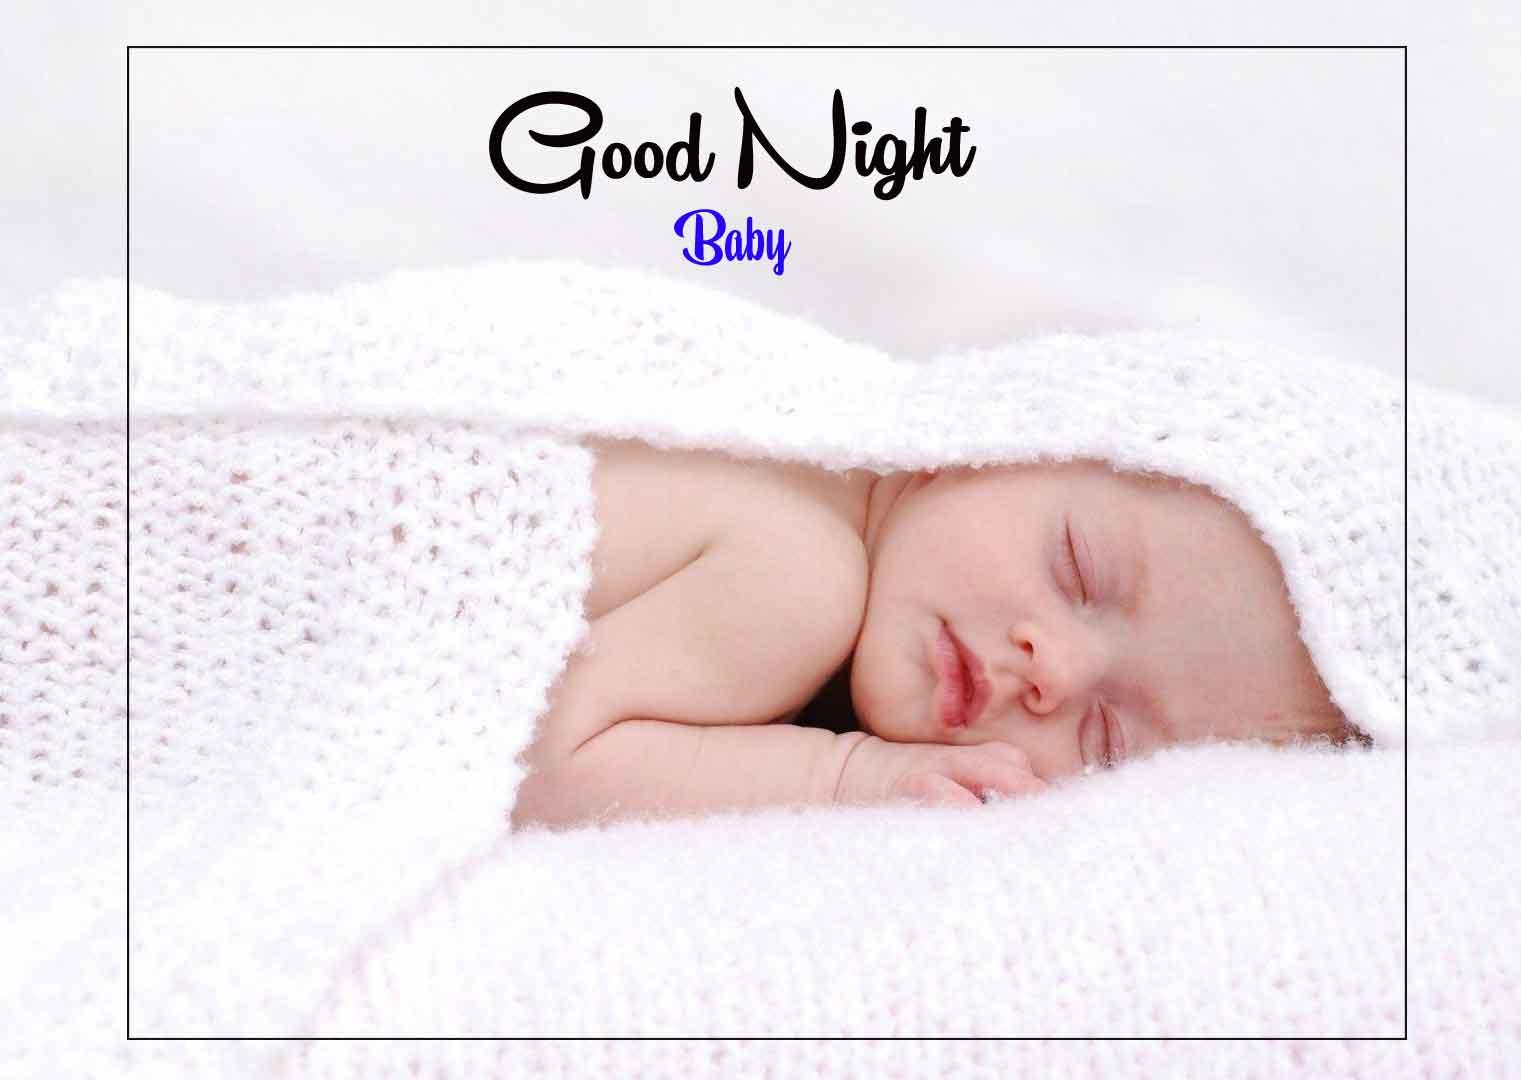 Free HD good night cute baby Imagres